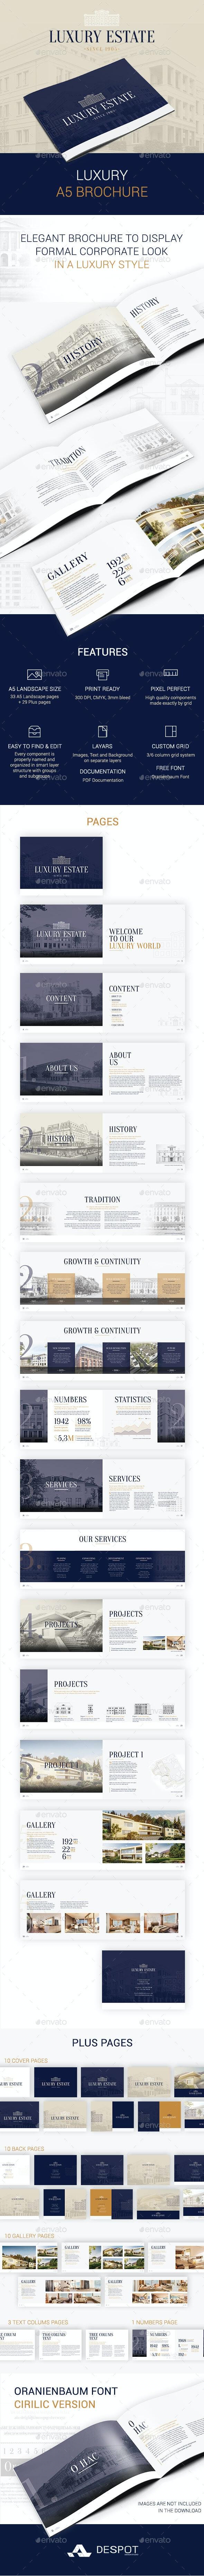 Luxury A5 Brochure - Brochures Print Templates